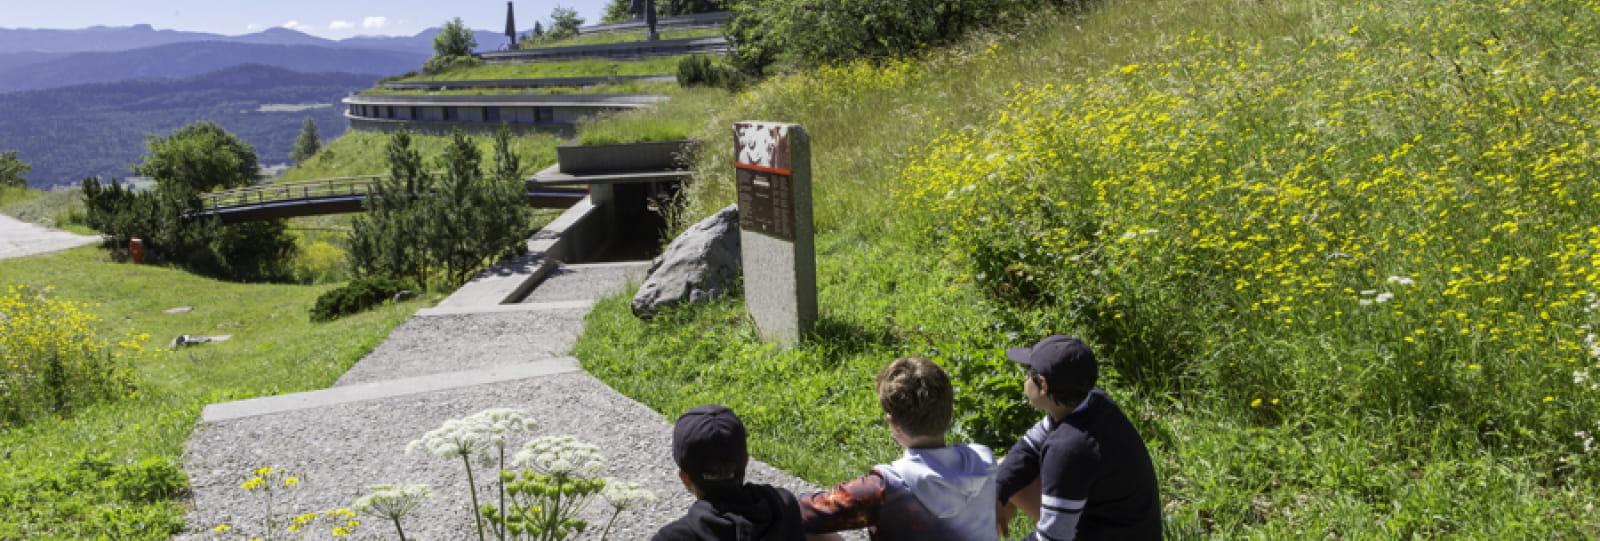 The Vercors Resistance Memorial